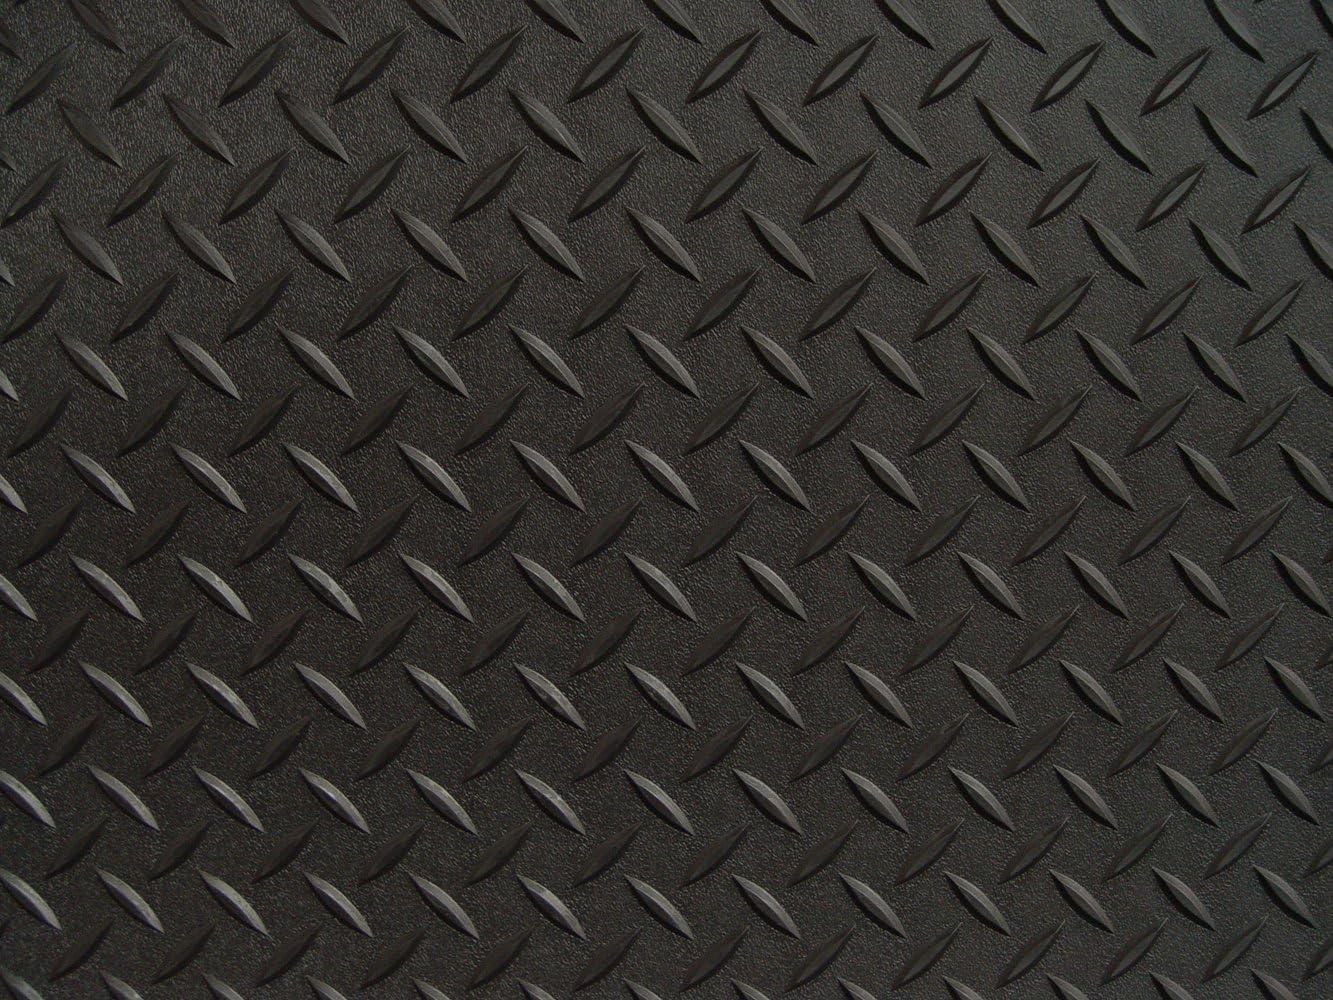 RoughTex 84714 Black Diamond Deck 7.5 x 14 Small Car Mat Various Options Available